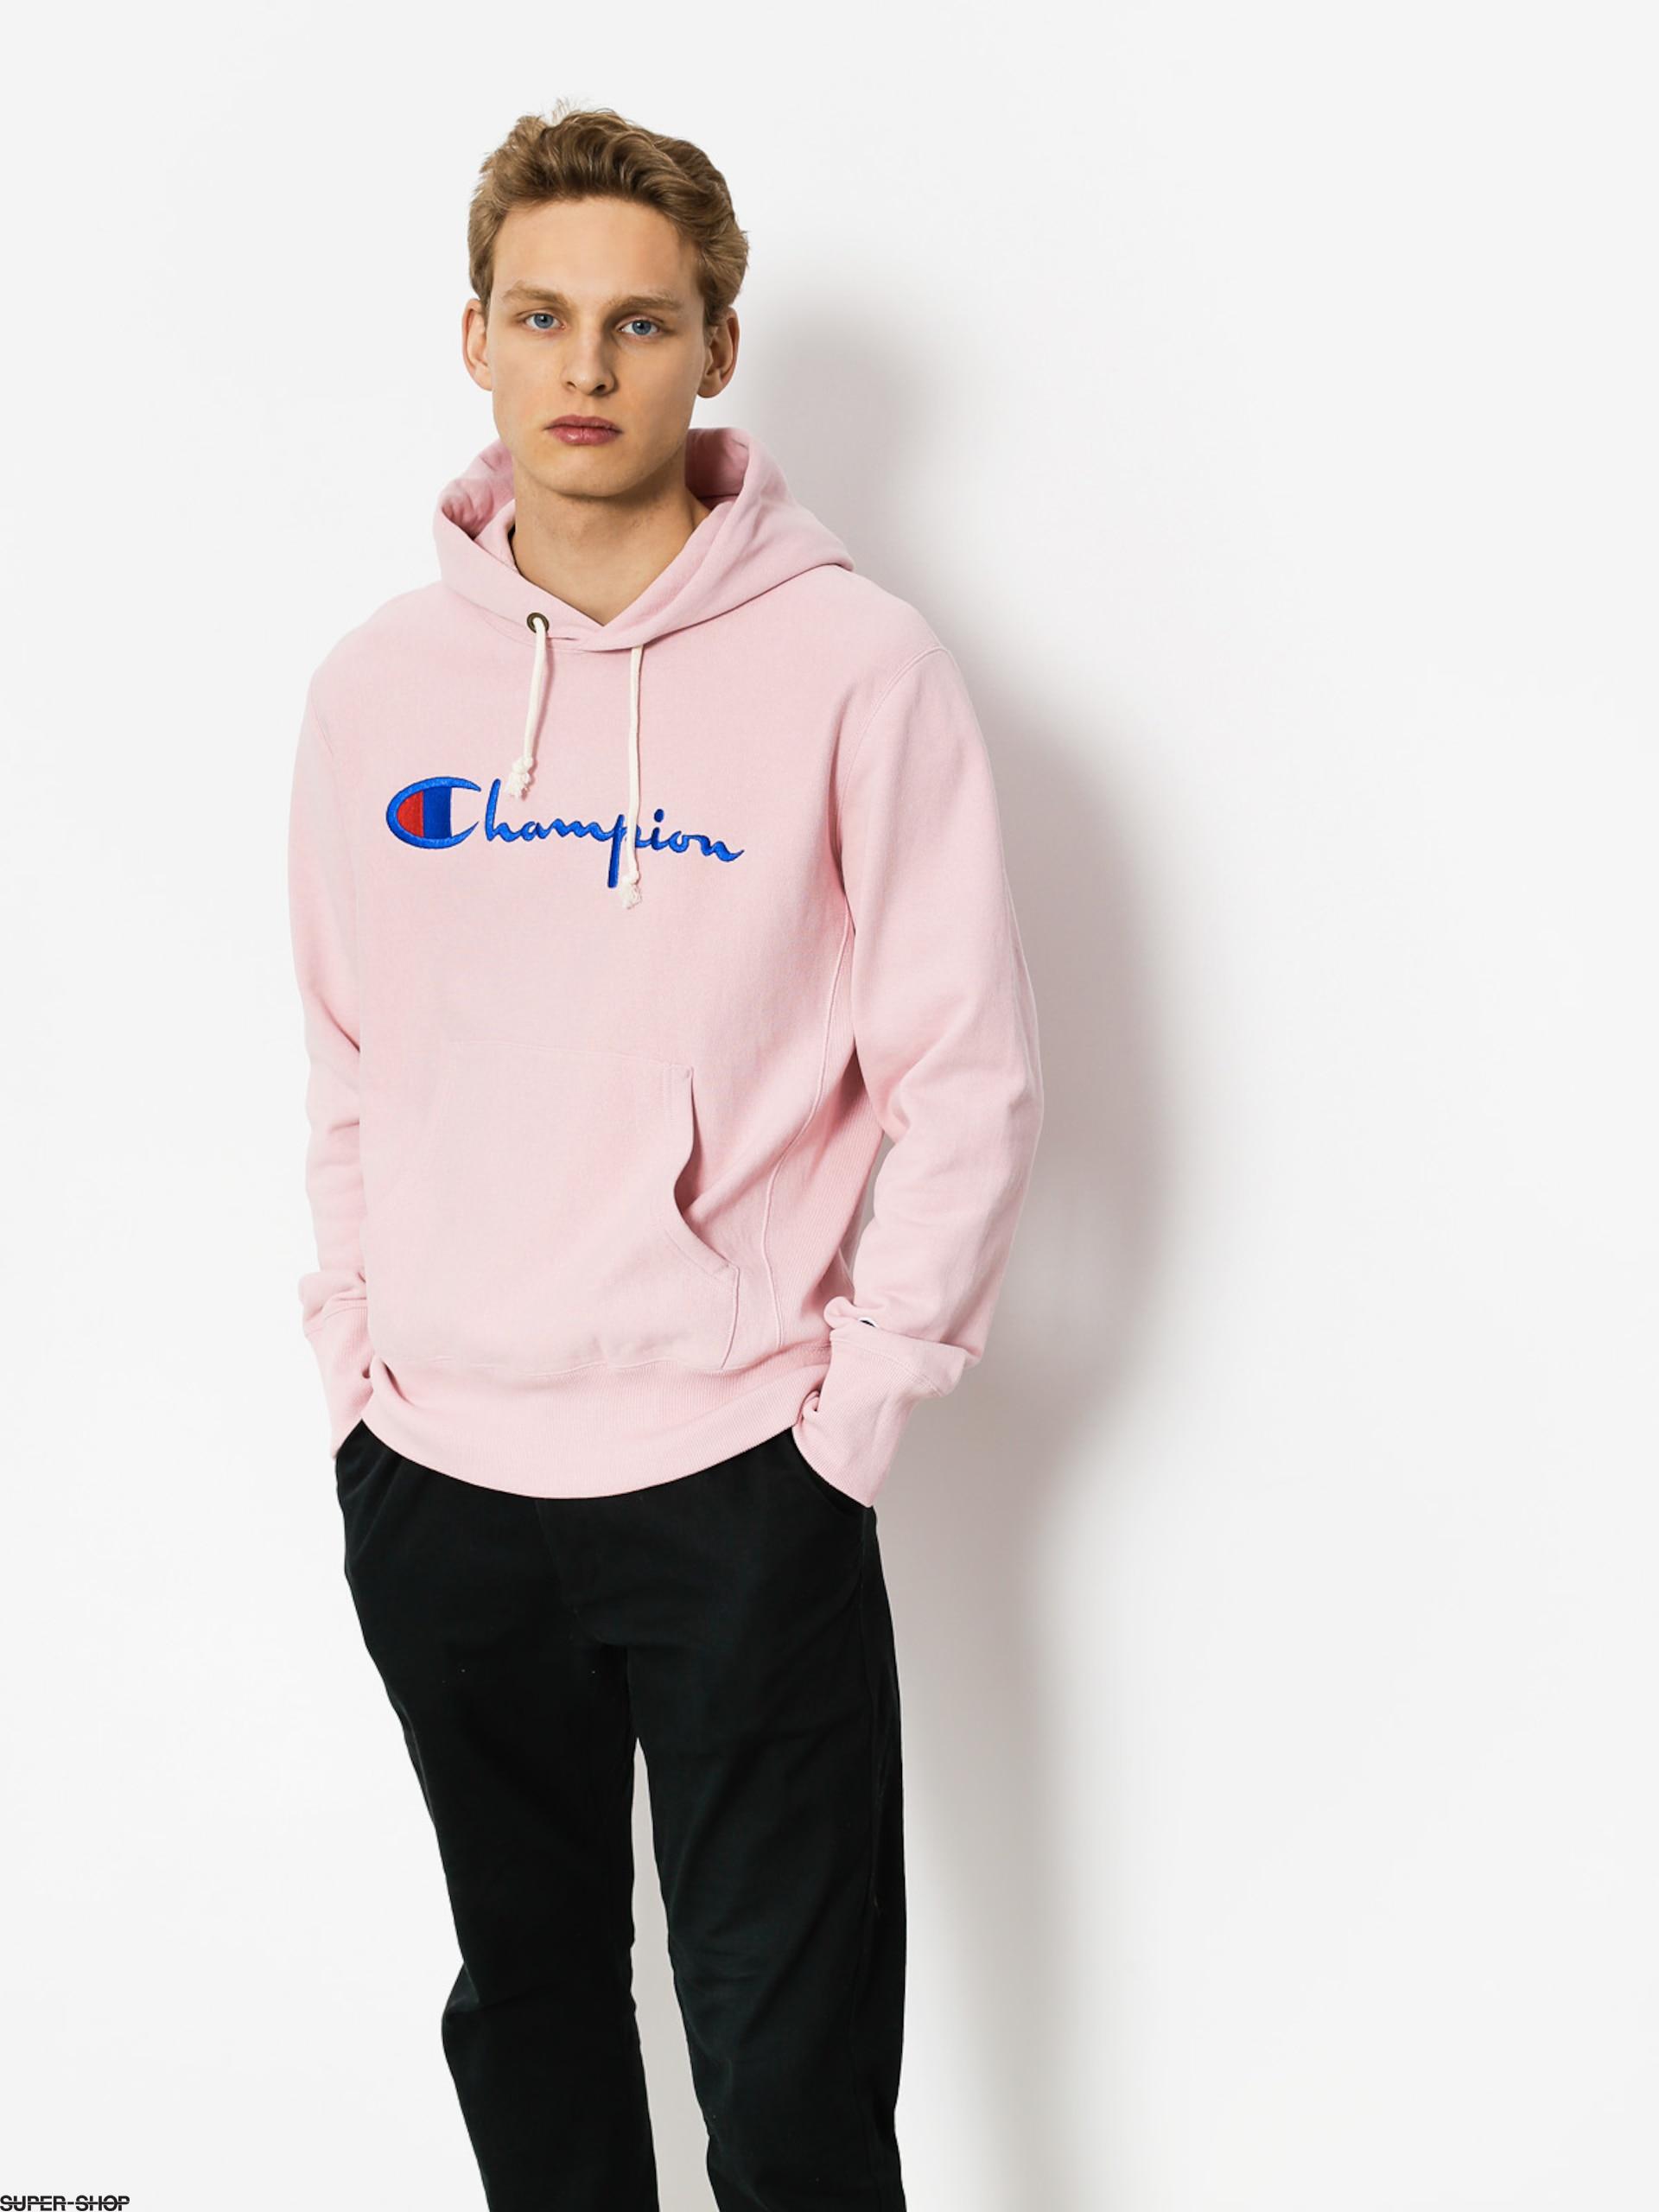 1378d908 914791-w1920-champion-hoodie-reverse-weave-hooded-sweatshirt-hd-cbs.jpg